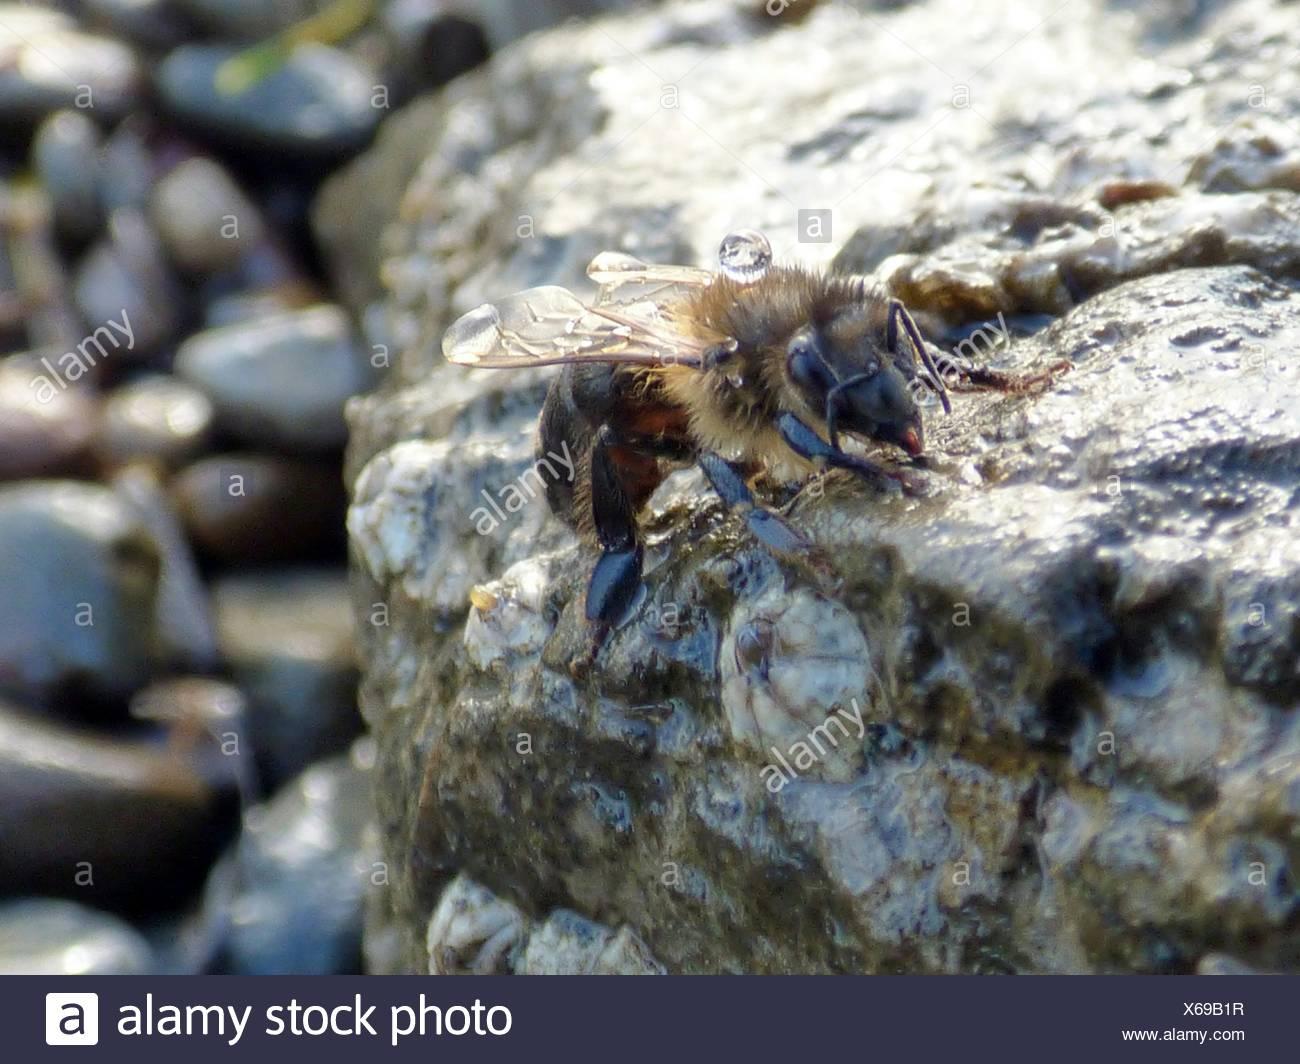 Close-Up Of Honey Bee On Rock Stock Photo